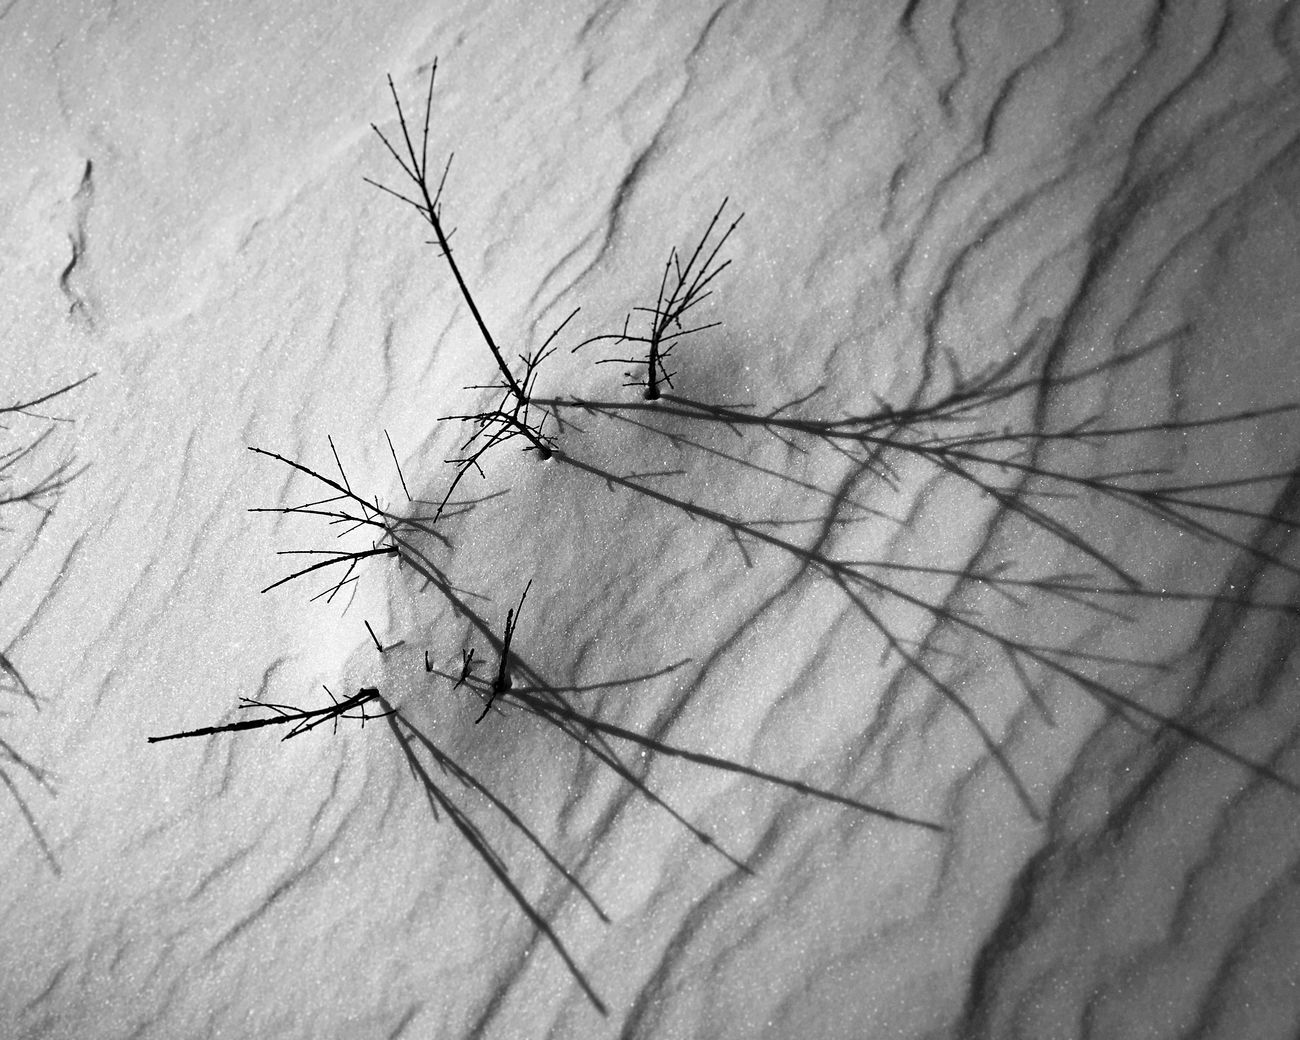 Snow ❄ Shadows Marylandphotographer Black & White Monochrome MDinFocus Winter HarfordCounty Maryland Aberdeen